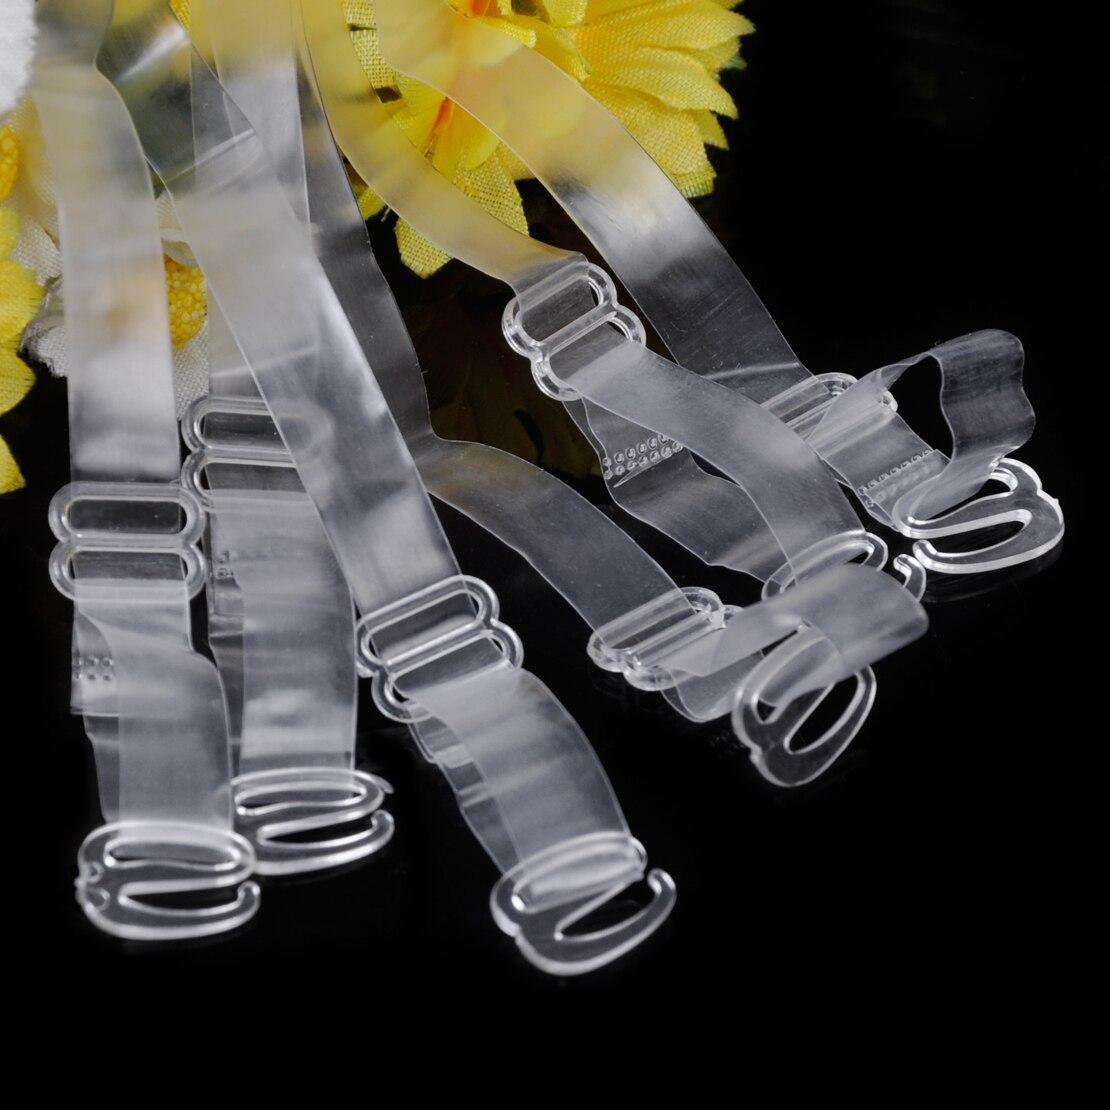 New 6 Pairs Ladies Bra Shoulder Straps Invisible Clear Transparent Adjustable Clasp Hook Woman 1cm Shoulder Straps 5